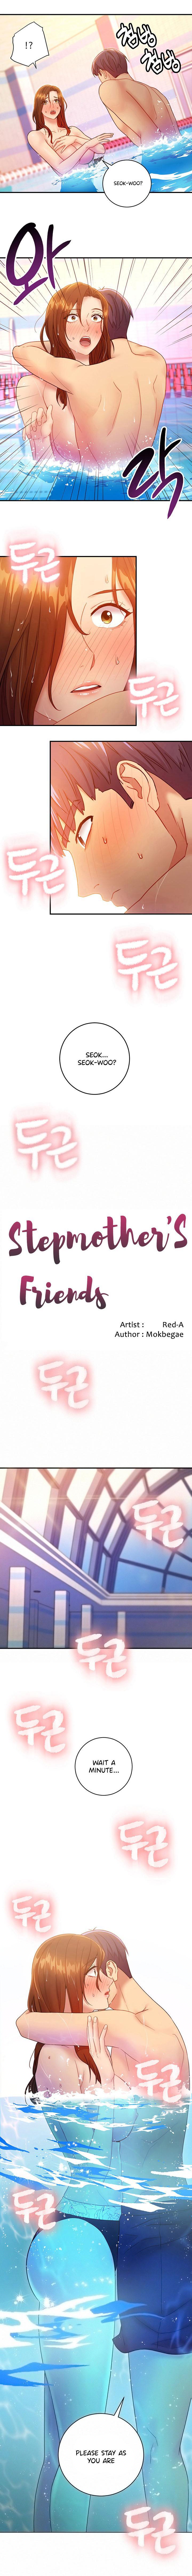 [Neck Pilllow] Stepmother Friends Ch.39/? [English] [Hentai Universe] NEW! 13/10/2020 317